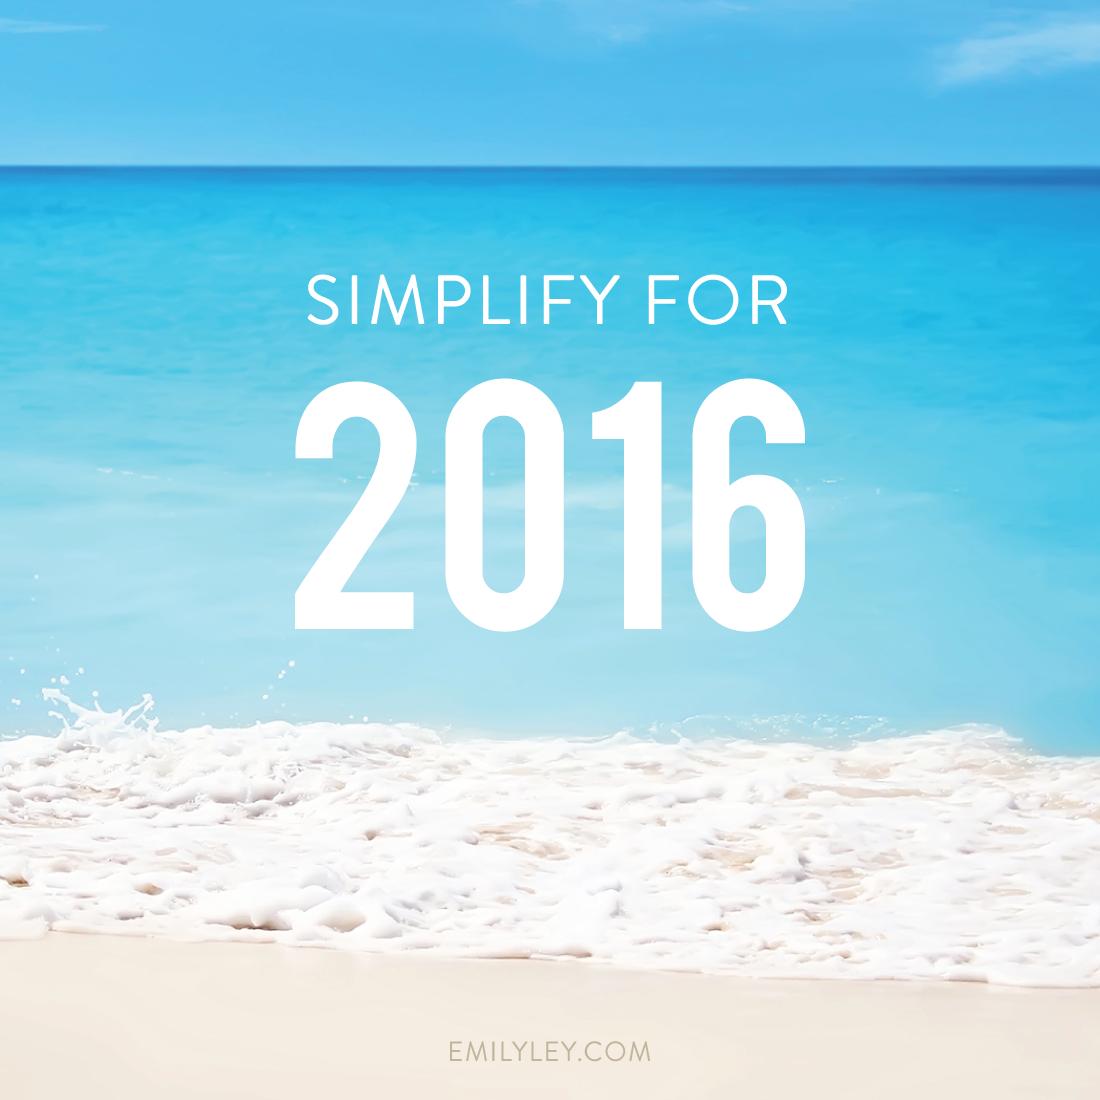 Simplifyfor2016_EmilyLey.png